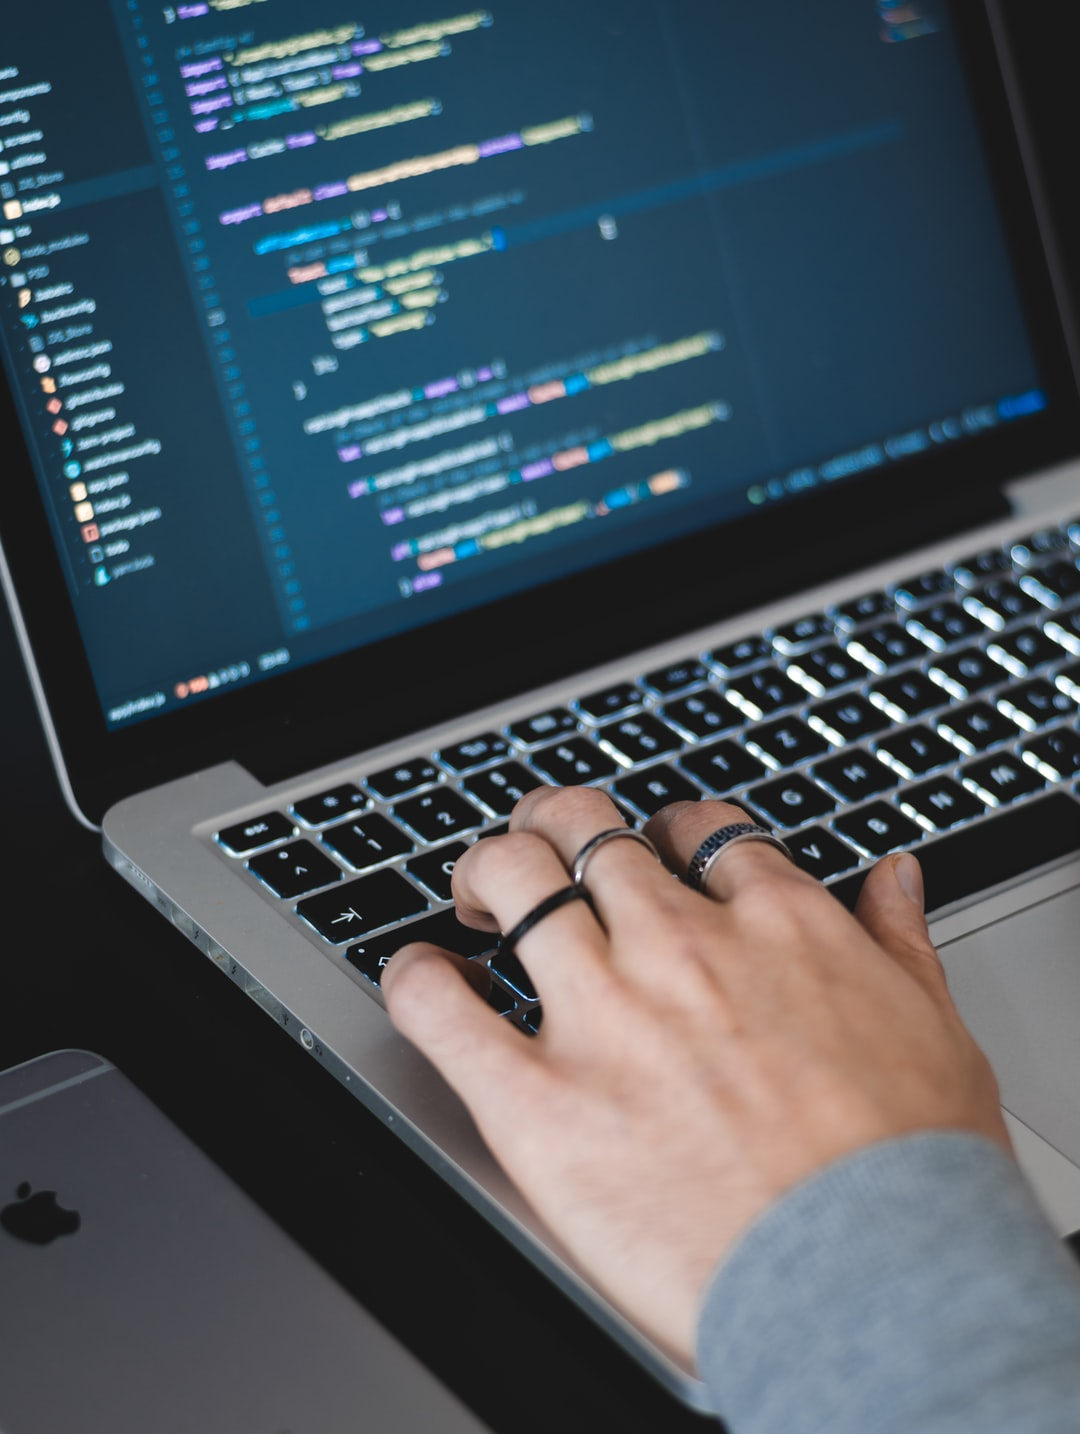 Coder Working on Macbook Pro